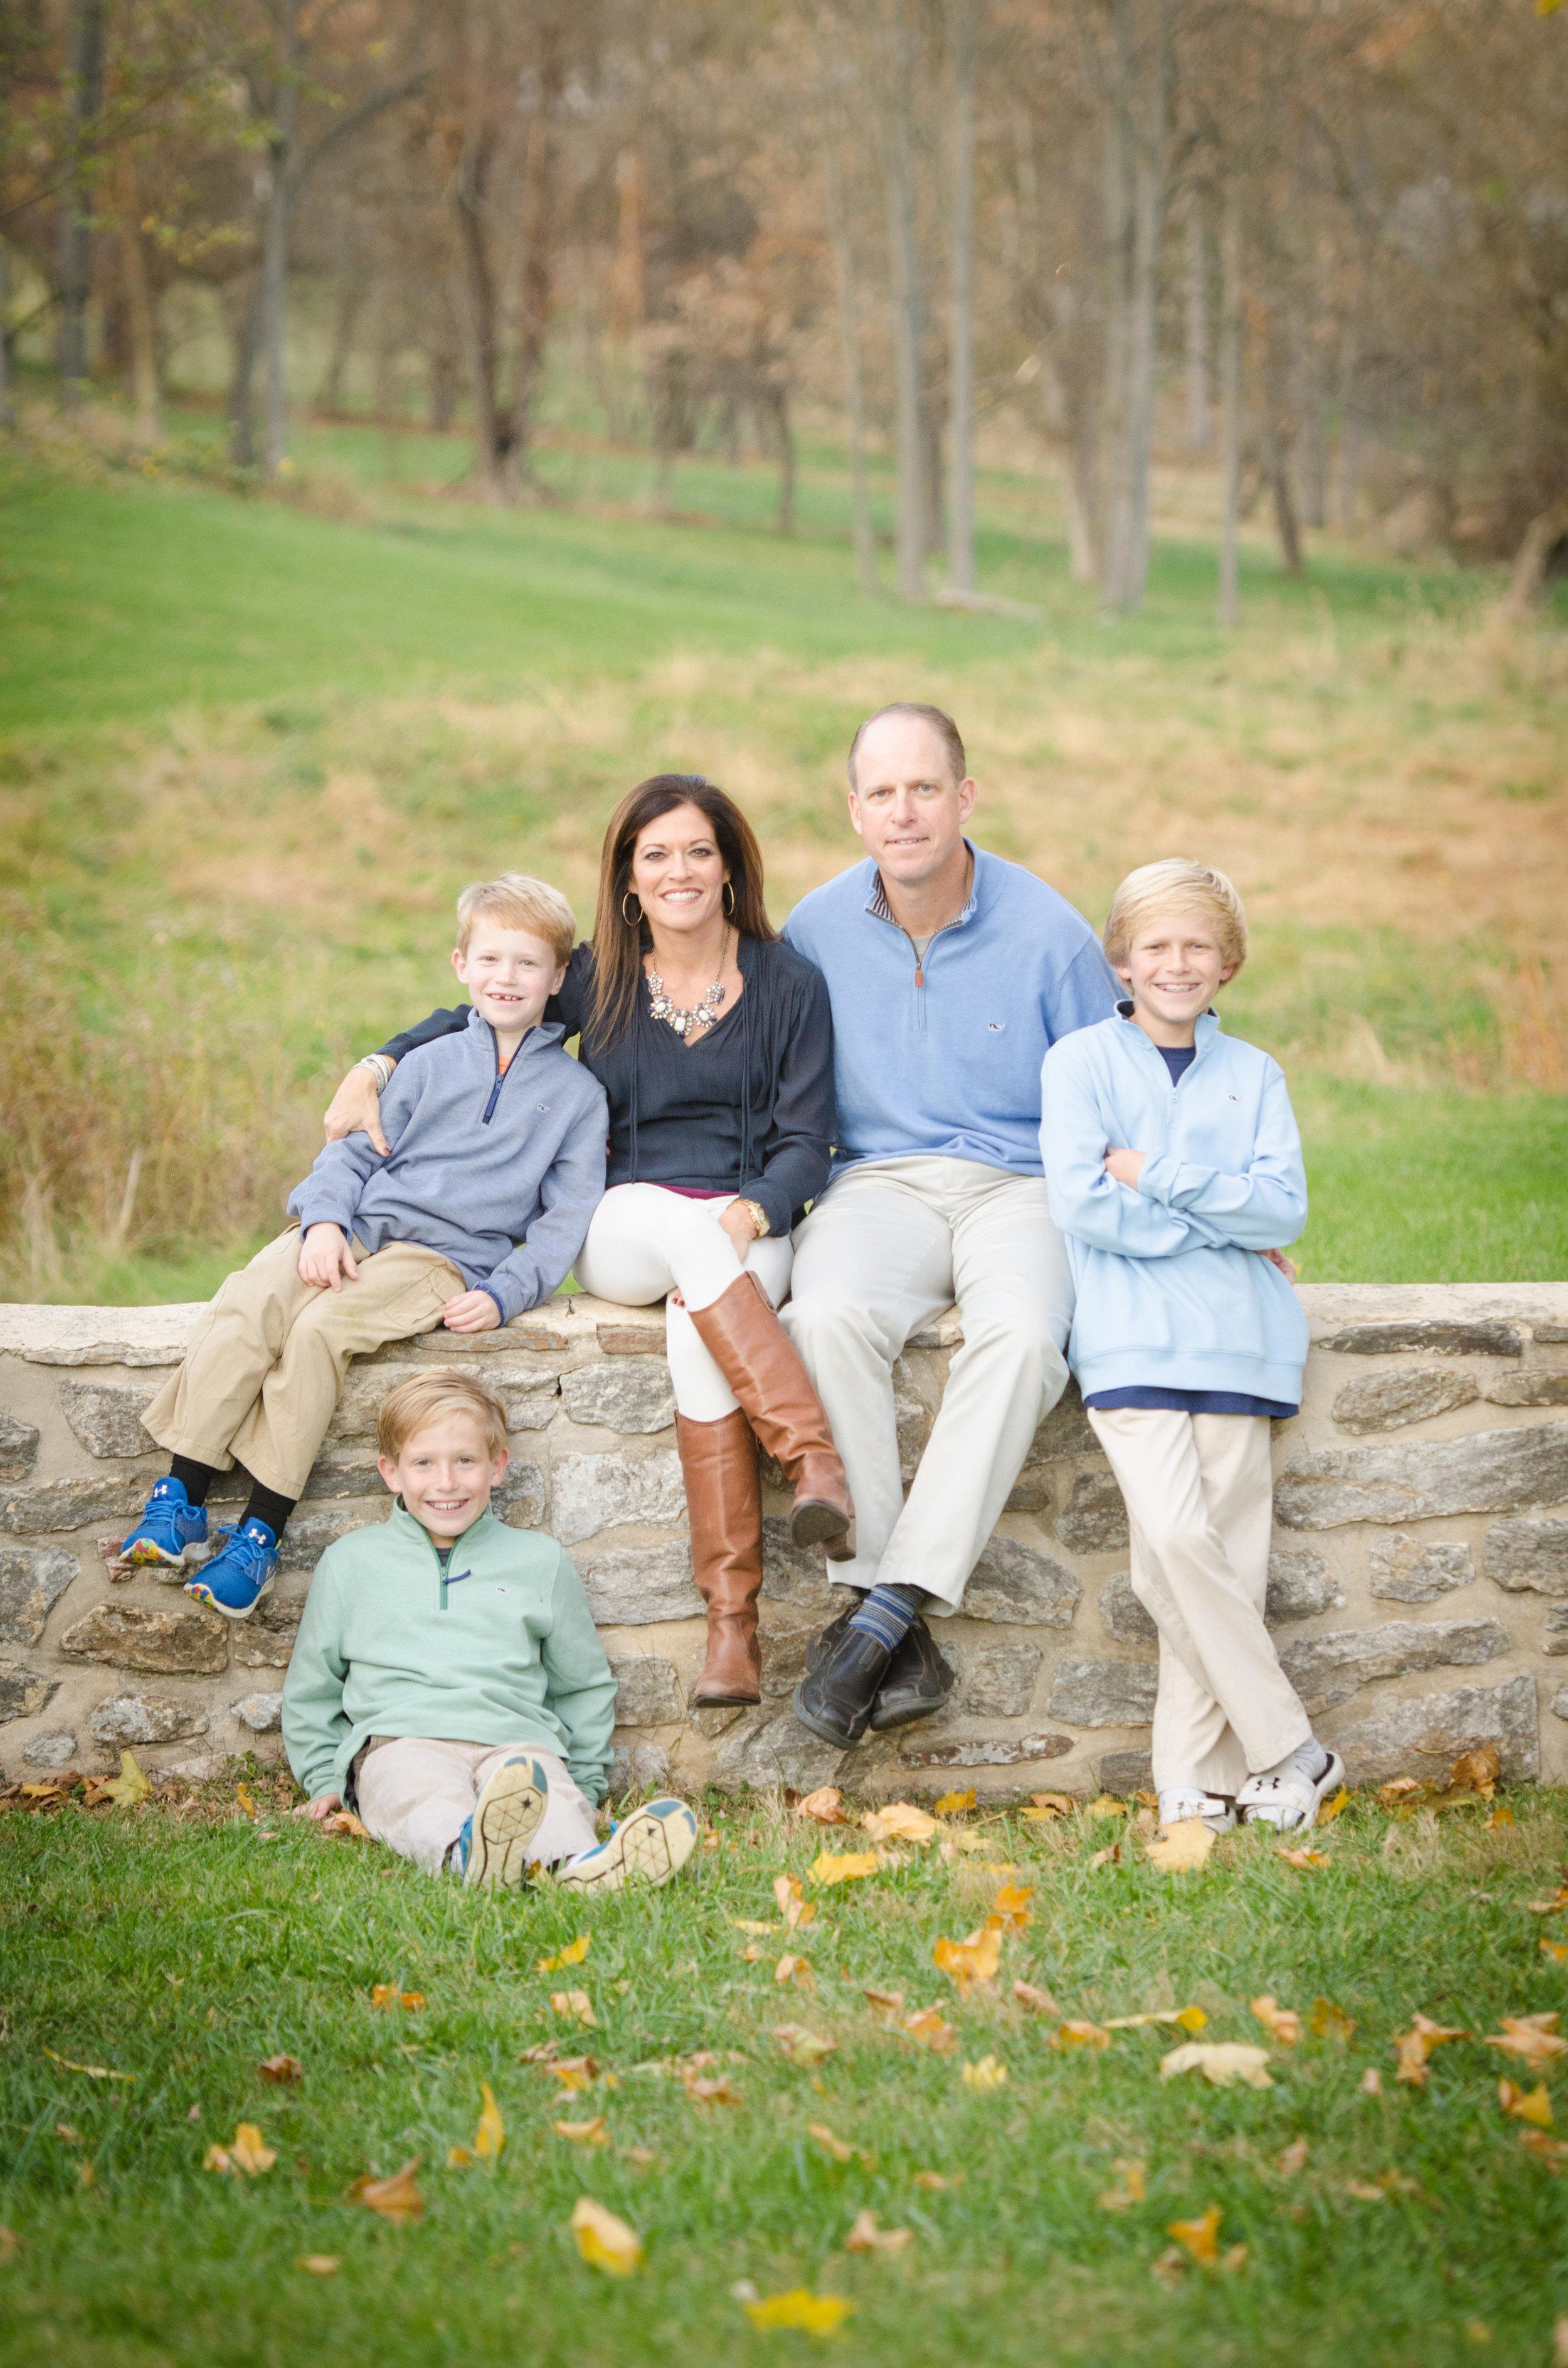 Hook Family Portraits-Hook Family Portraits-0054.jpg